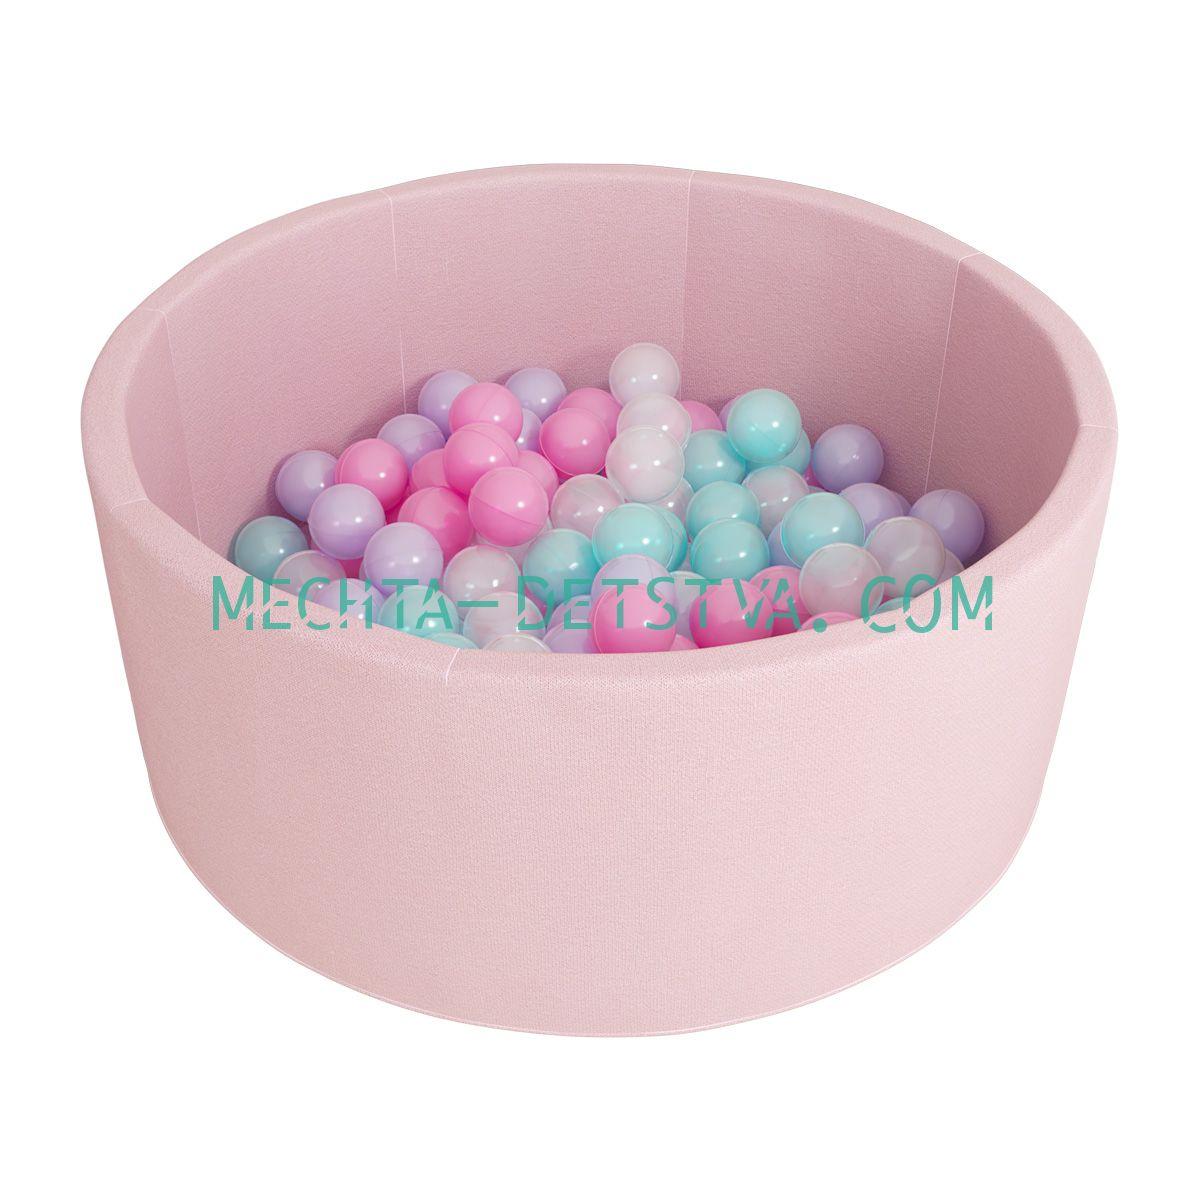 "Сухой бассейн Romana ""Airpool"" ДМФ-МК-02.53.01 (розовый с розовыми шариками)"